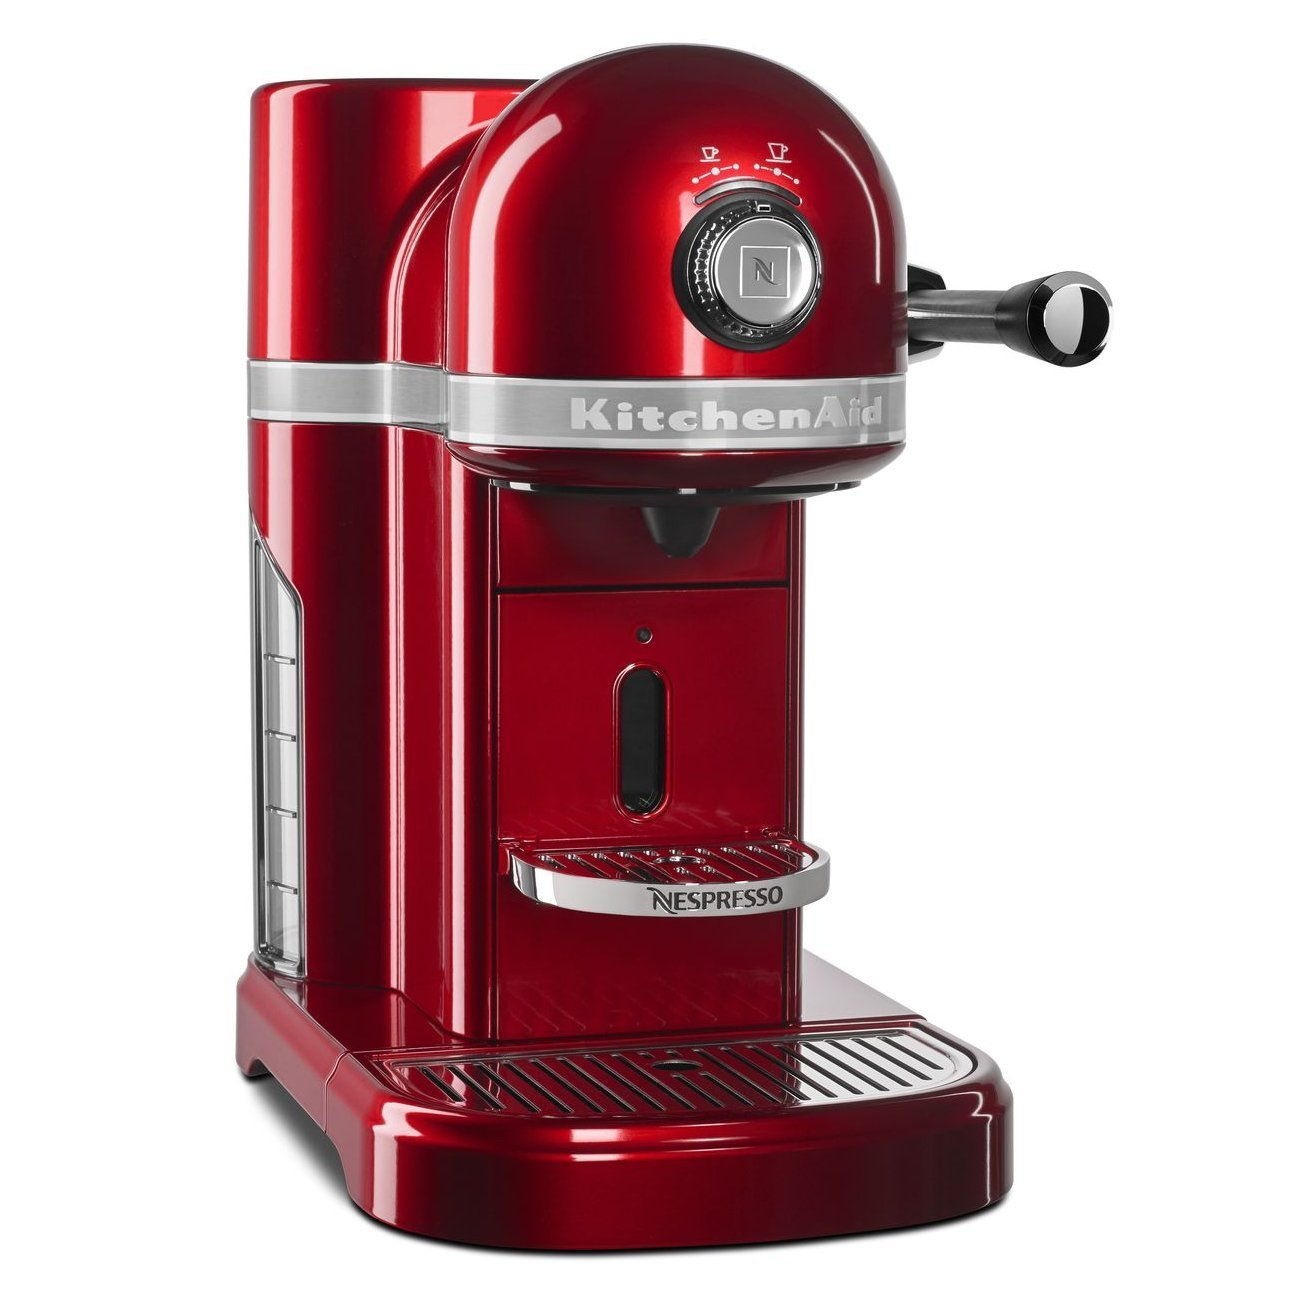 Nespresso By Kitchenaid Espresso Maker Treat Yourself To